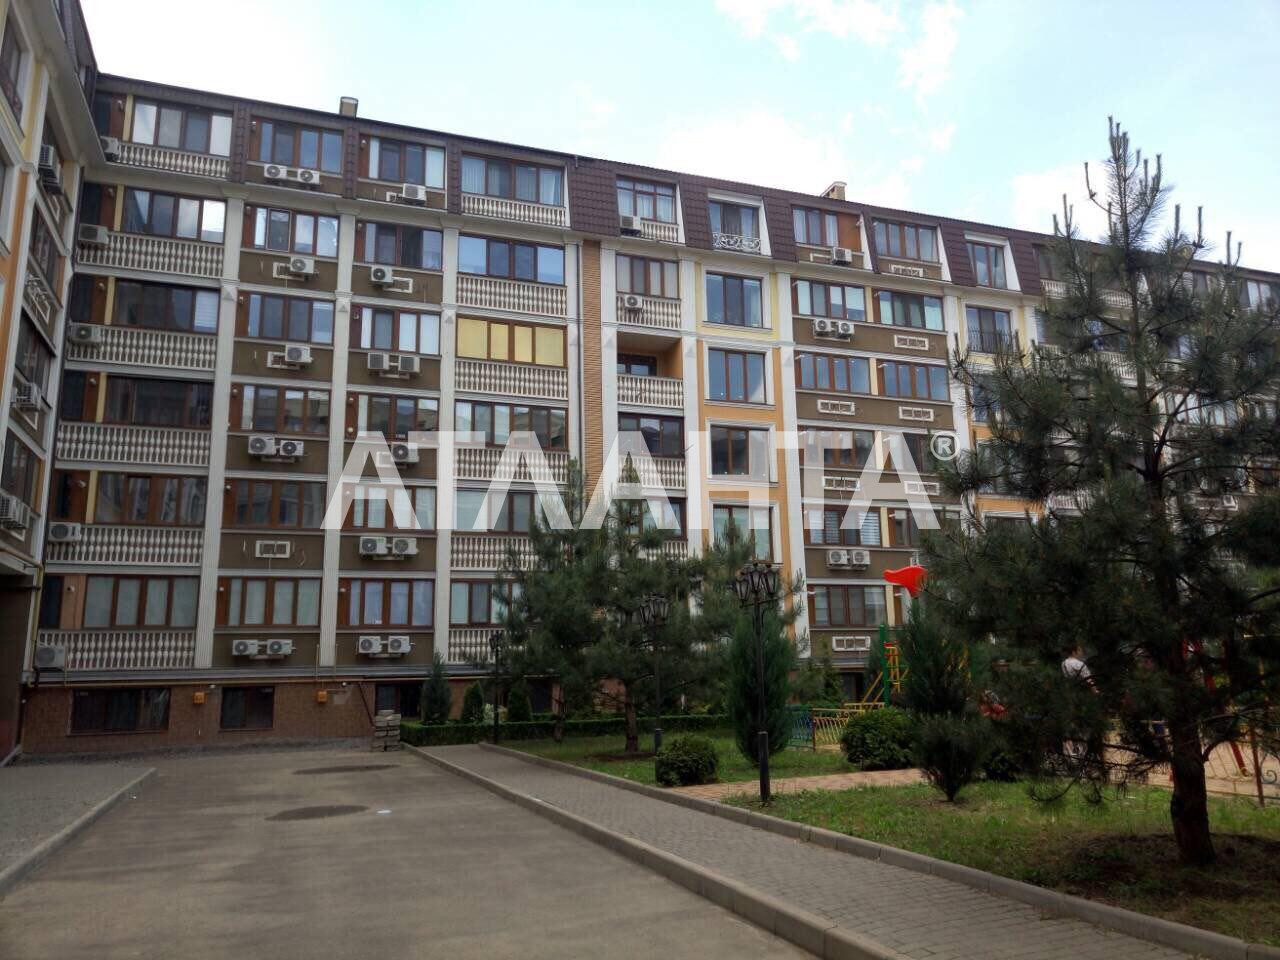 Продается 1-комнатная Квартира на ул. Говорова Марш. — 110 000 у.е. (фото №9)